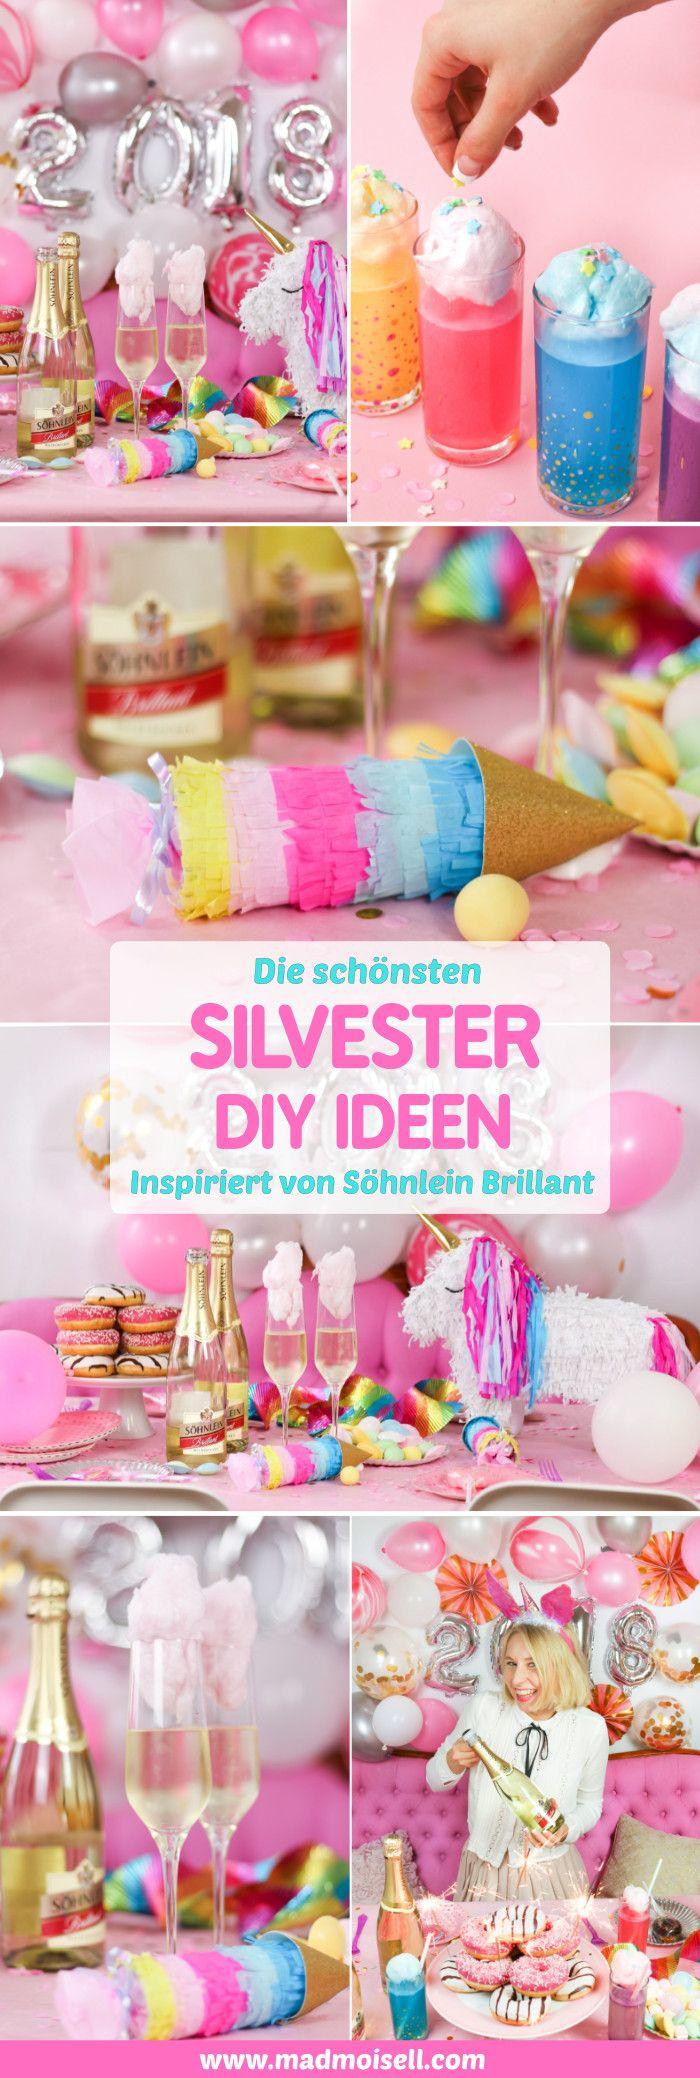 21 best diy silvester ideen f r 39 s neue jahr images on. Black Bedroom Furniture Sets. Home Design Ideas